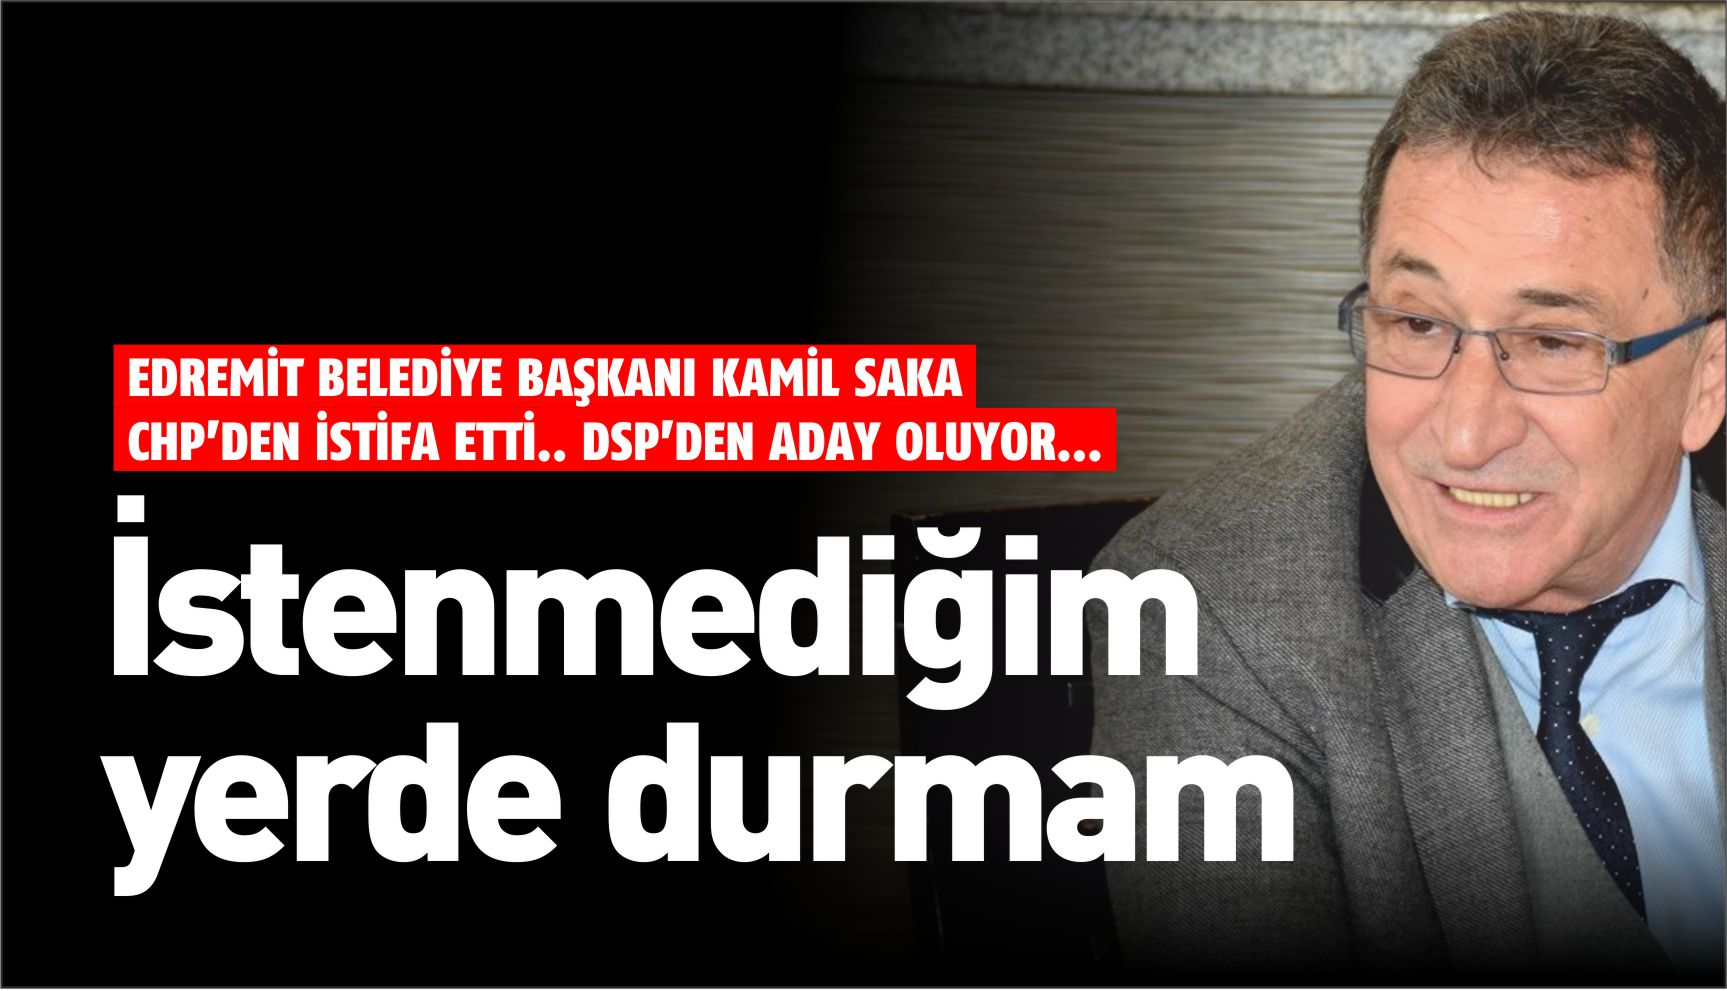 KAMİL SAKA CHP'DEN İSTİFA ETTİ, DSP'DEN ADAY OLUYOR